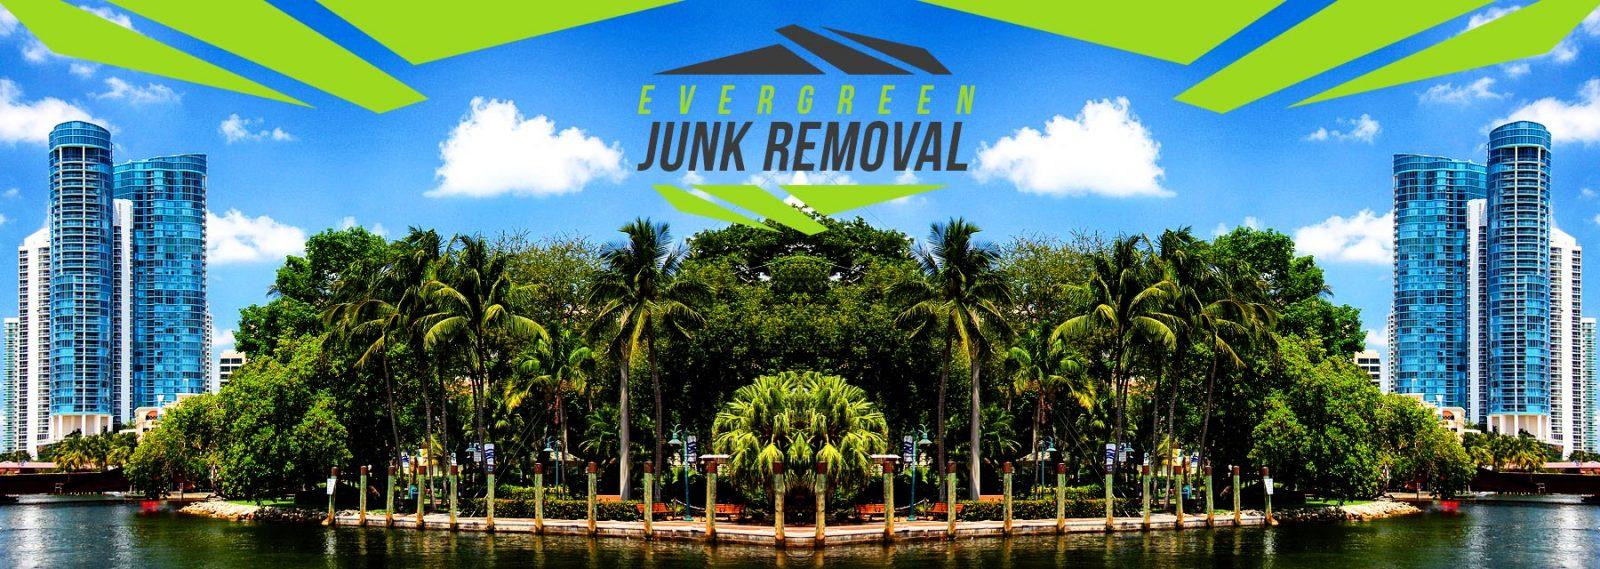 Pembroke Park Hot Tub Removal Company